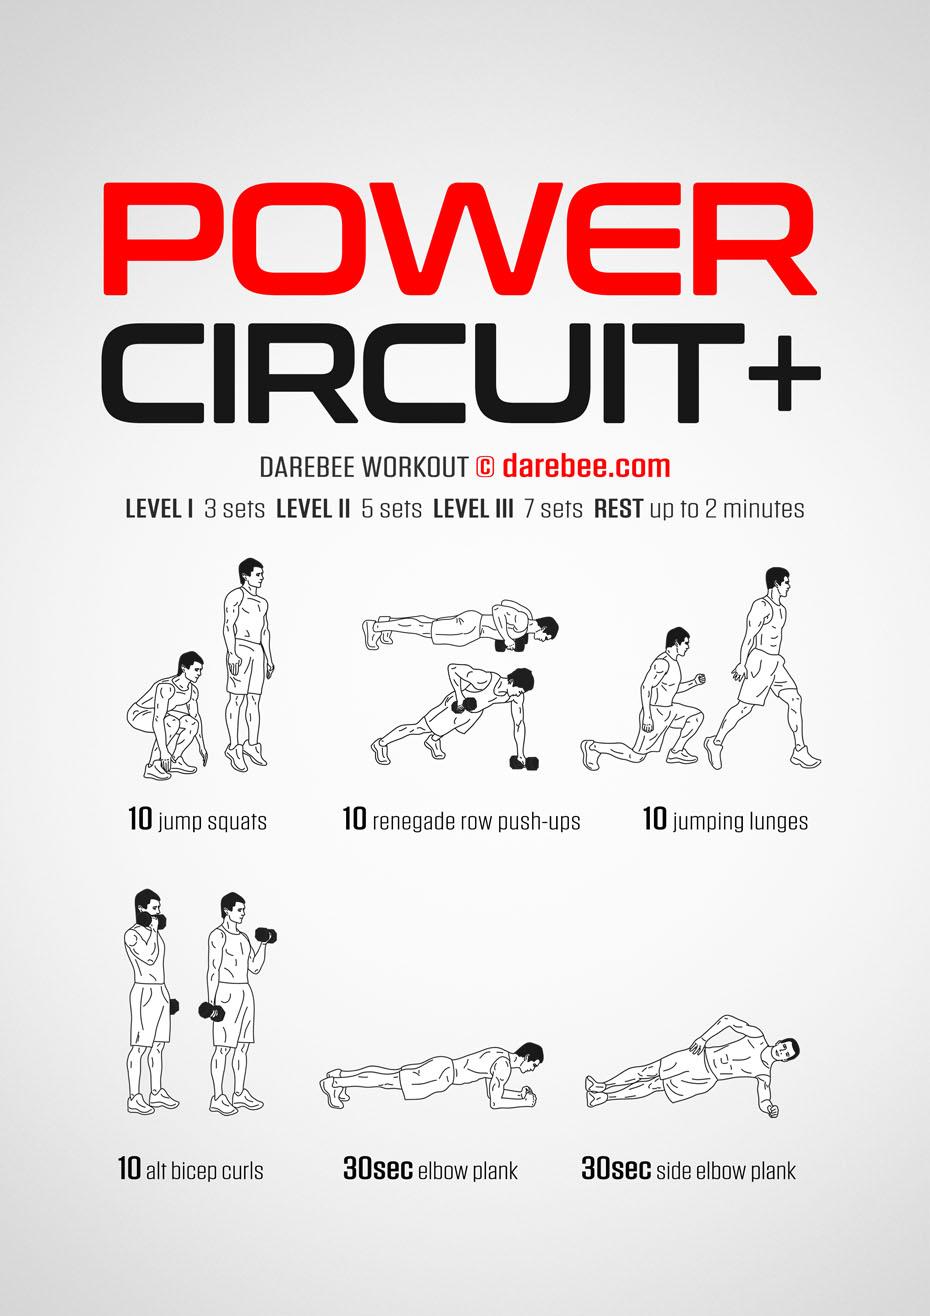 Power Circuit Plus Workout